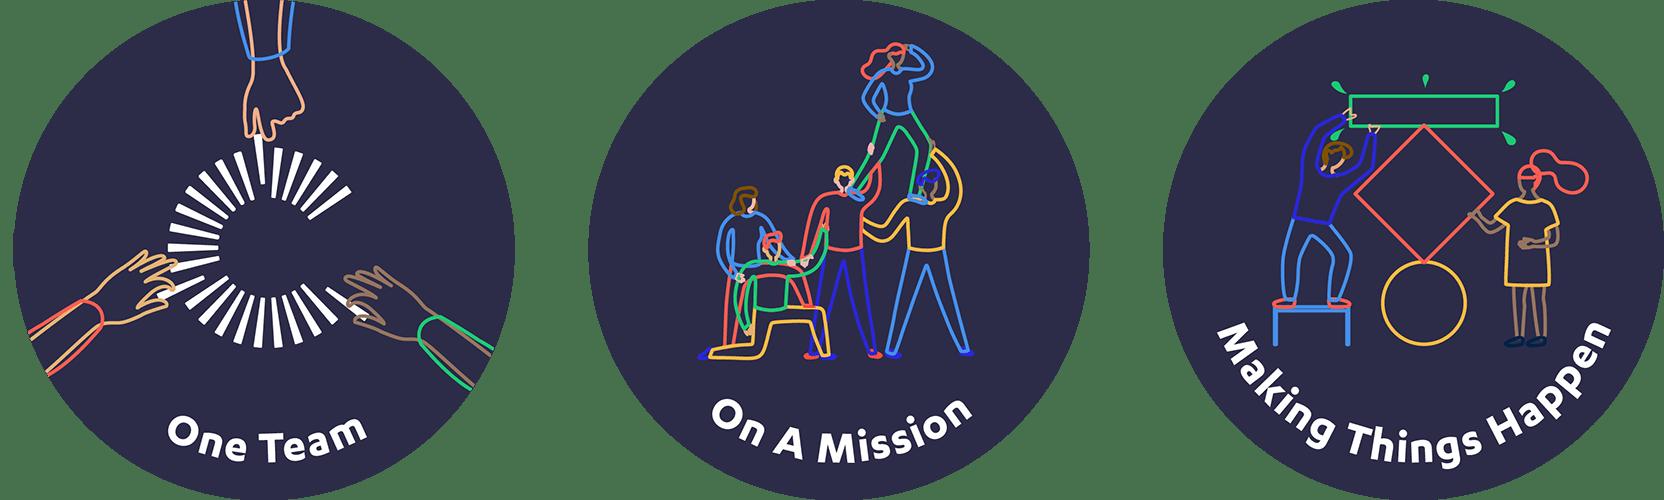 Culture Team stickers